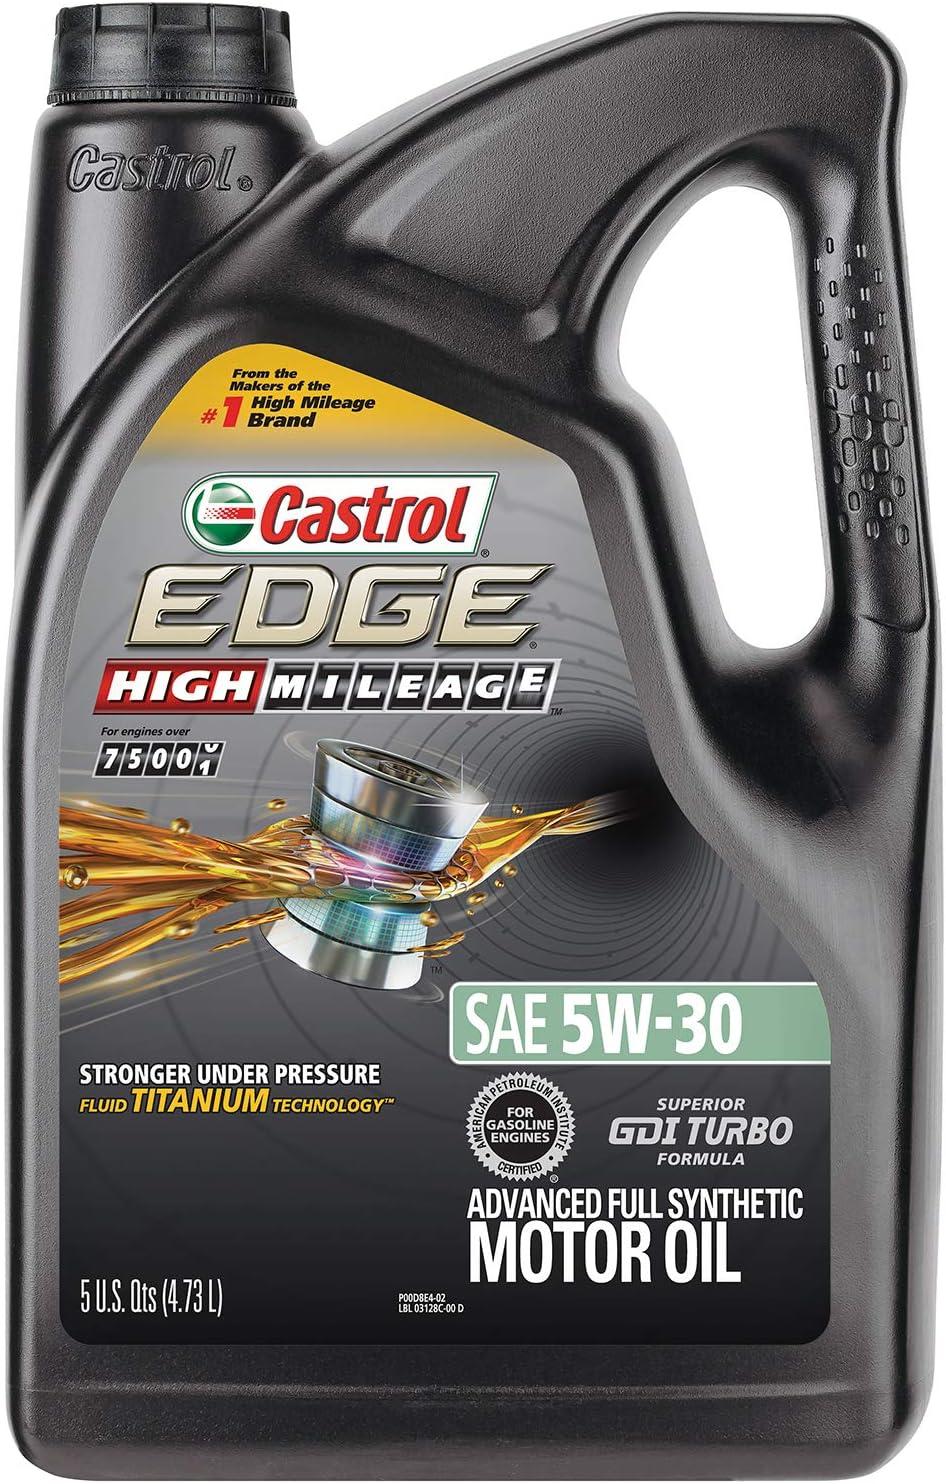 Castrol 03128C EDGE High Mileage 5W-30 Advanced Full Synthetic Motor Oil, 5 quart,Black